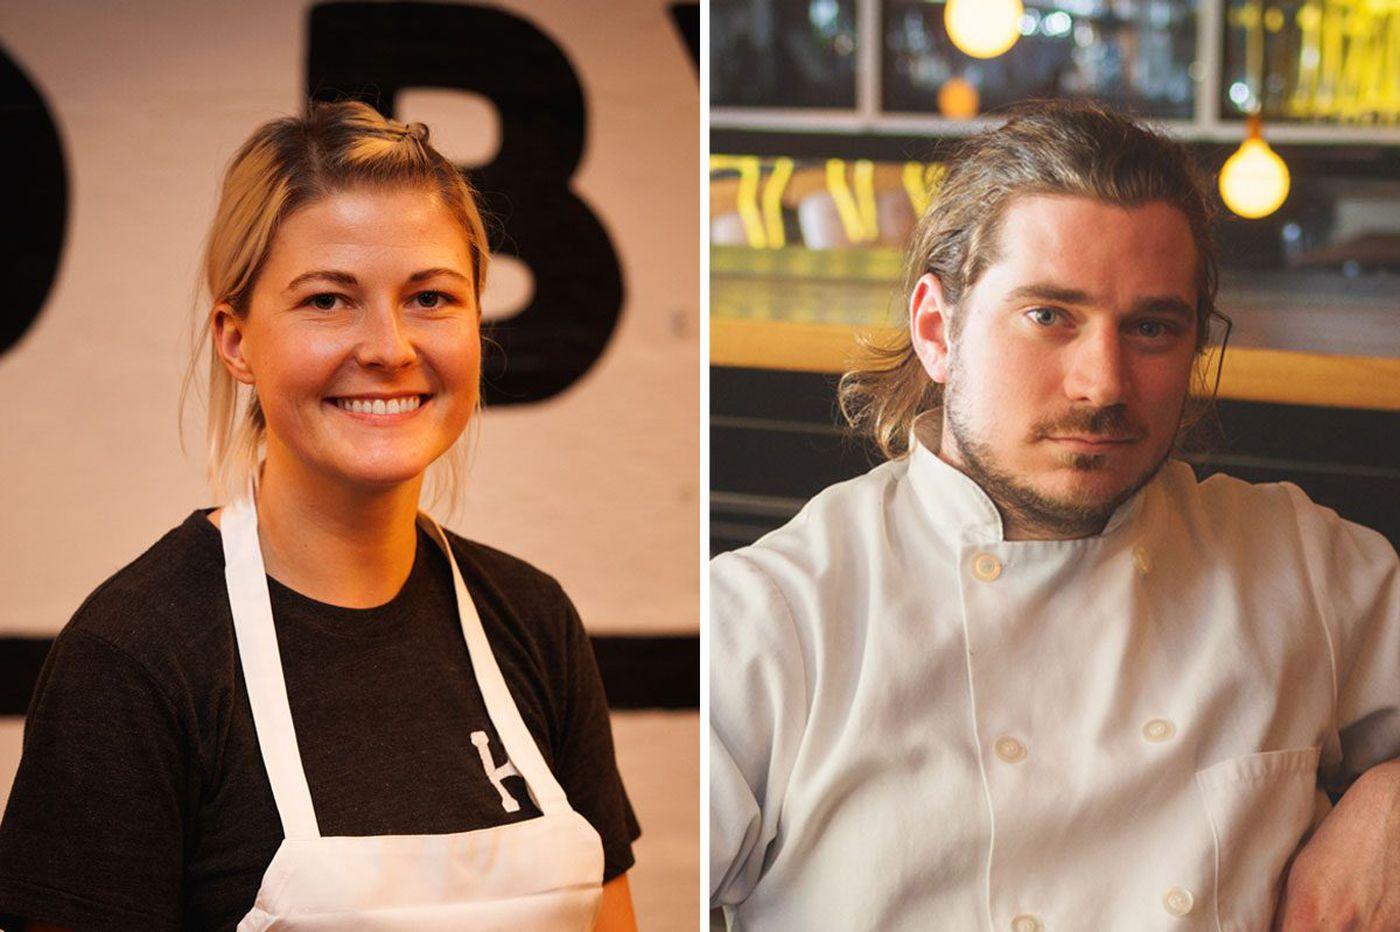 Chef changes at Le Virtu/Brigantessa, The Farmhouse